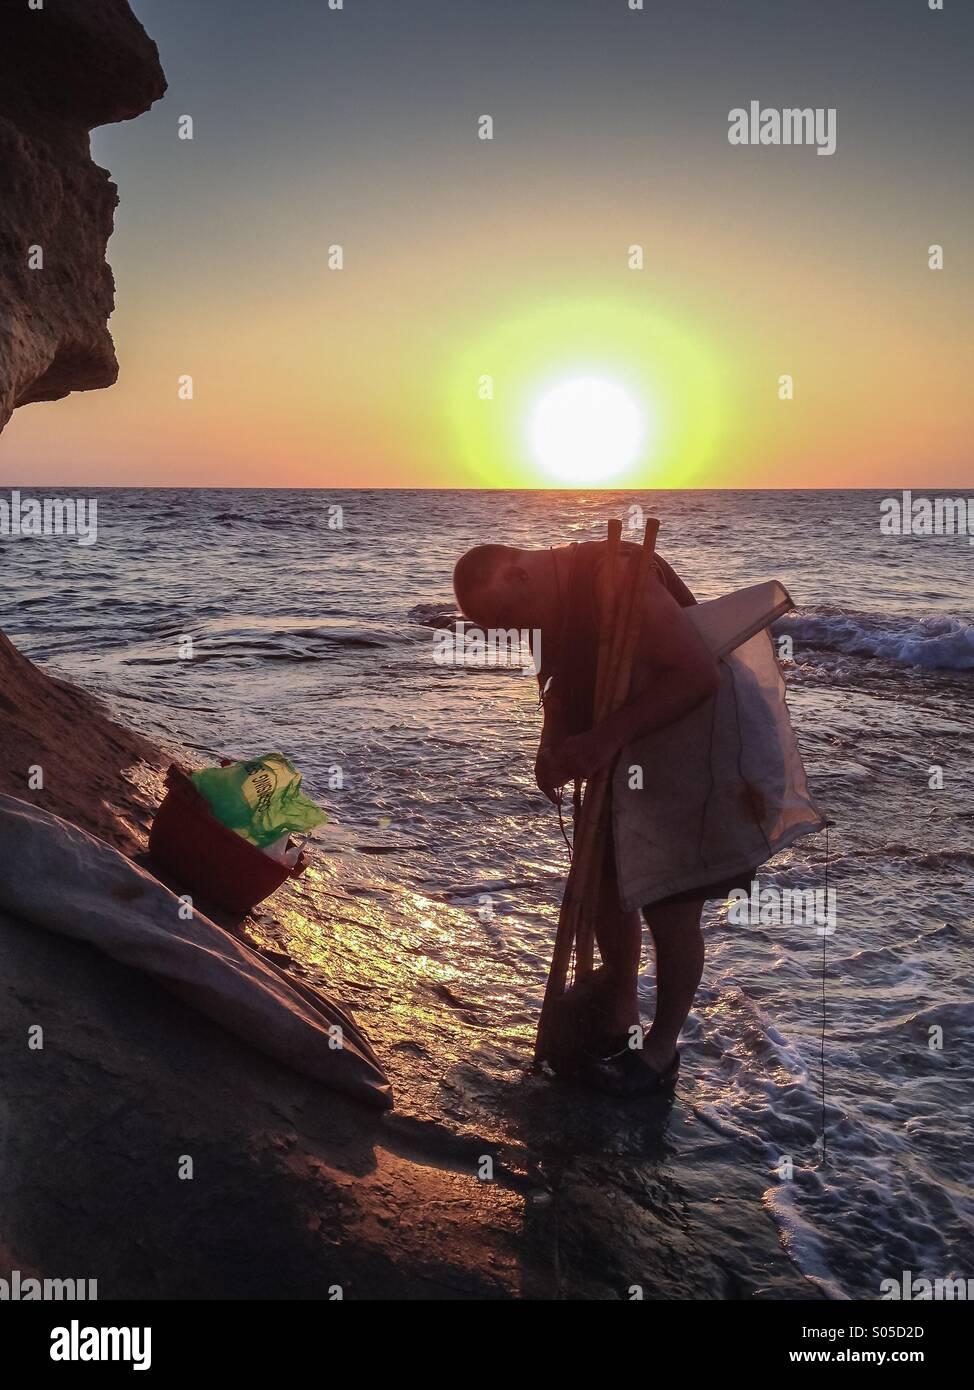 Fisherman at dawn preparing traditional float and sail - Stock Image